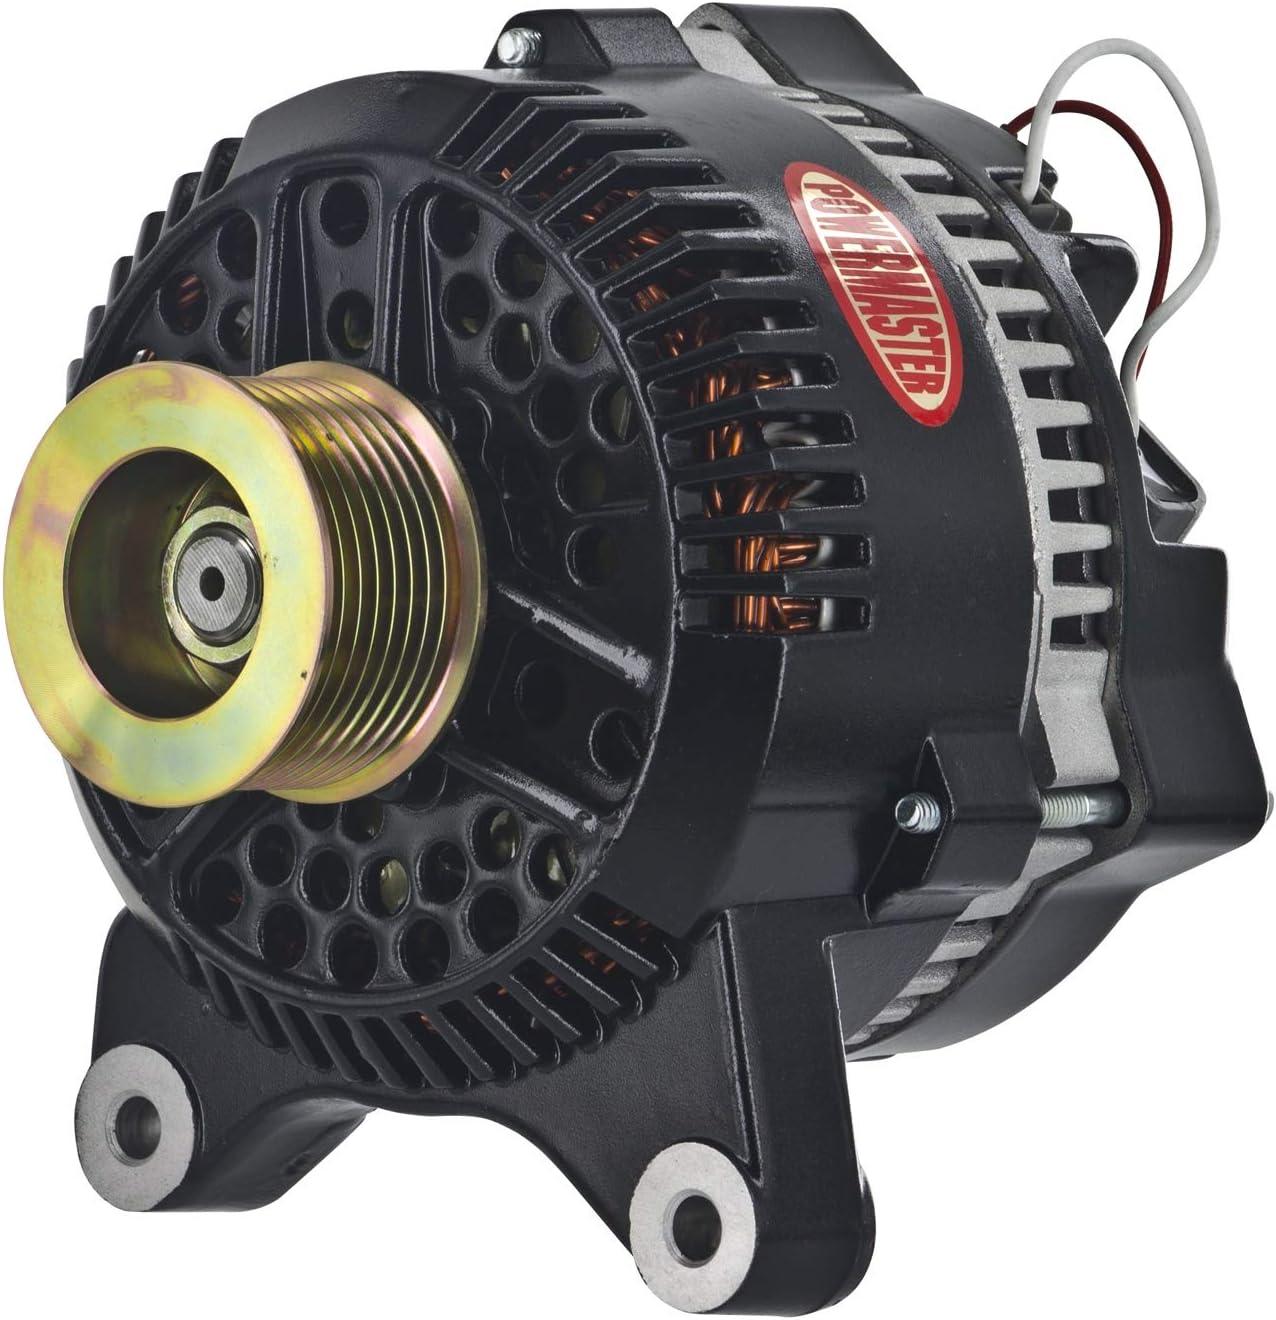 [SCHEMATICS_48YU]  Amazon.com: Powermaster 577631 Alternator (Ford 3G Black 200A 8 grv Pulley  Large Frame V Mtg 1-Wire), 1 Pack: Automotive | Ford Powermaster Alternators Wiring |  | Amazon.com